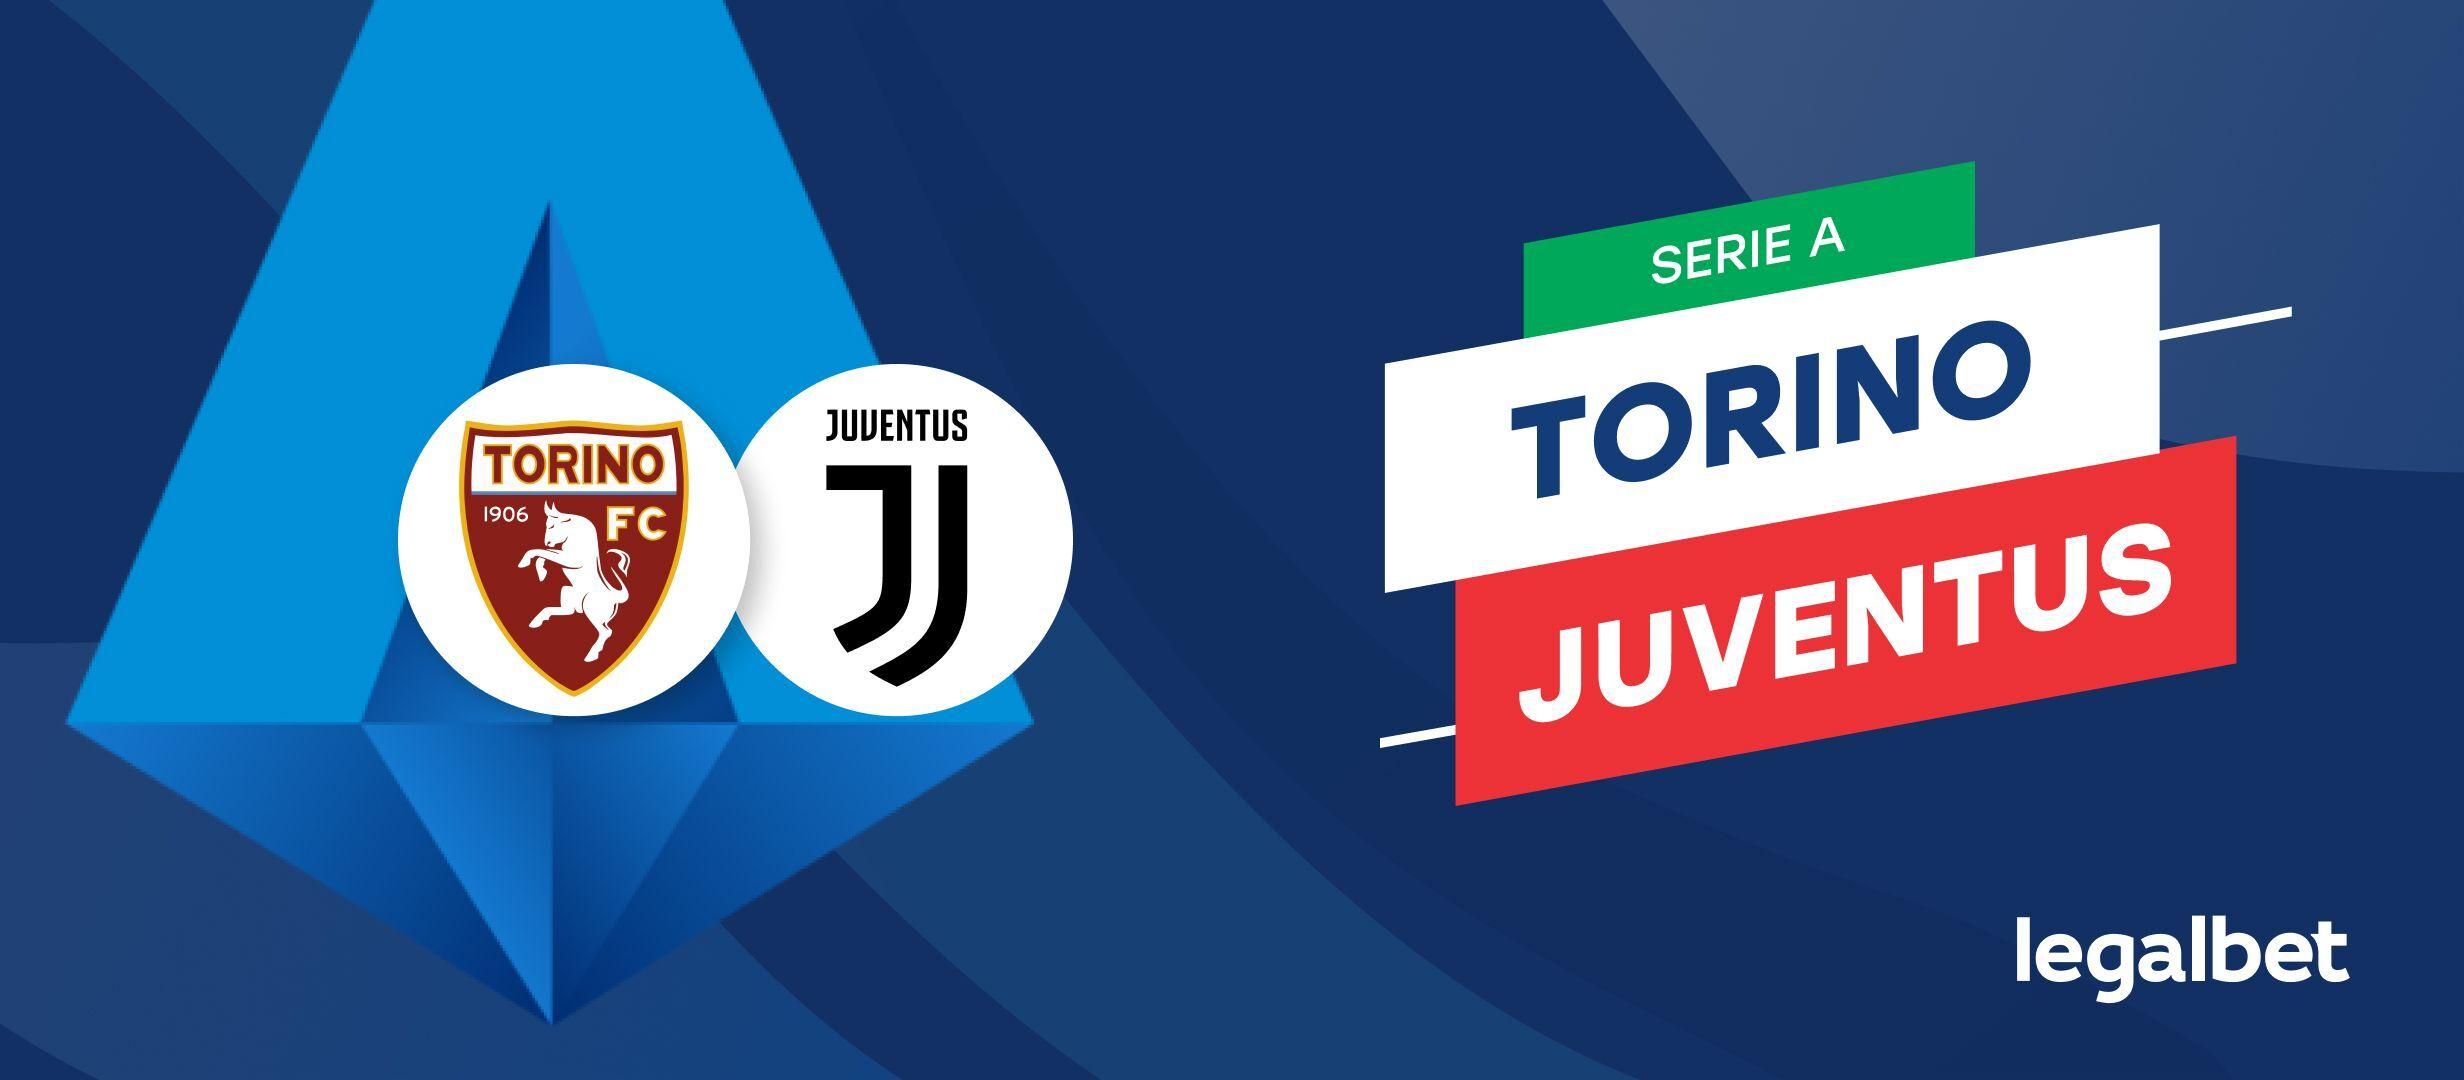 Torino - Juventus, cote la pariuri, ponturi şi informaţii